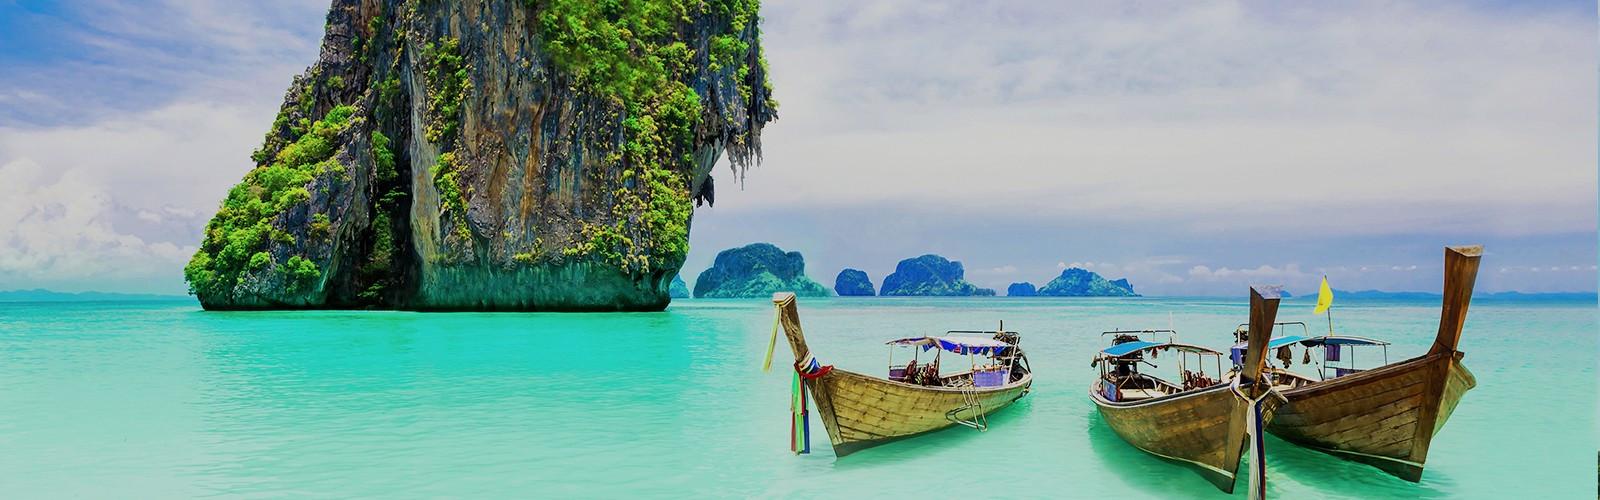 thailand-luxury-Holidays-1600x500.jpg